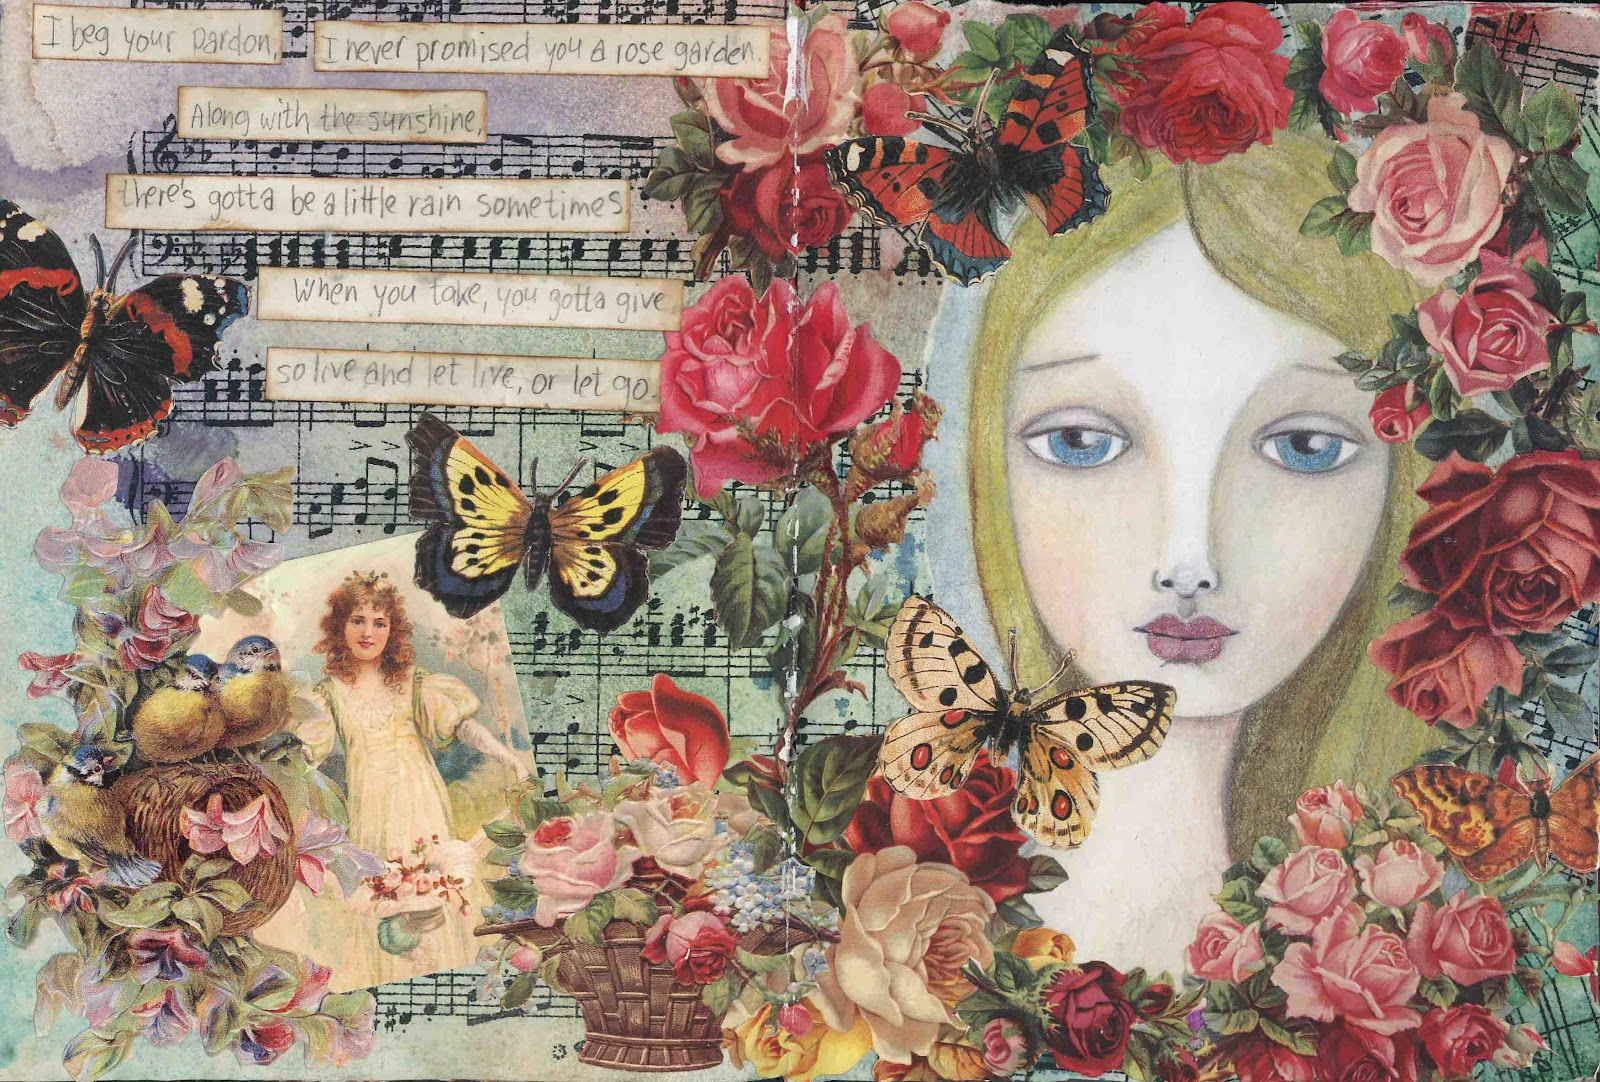 Anniek 39 s art rosegarden for Lynn anderson rose garden lyrics